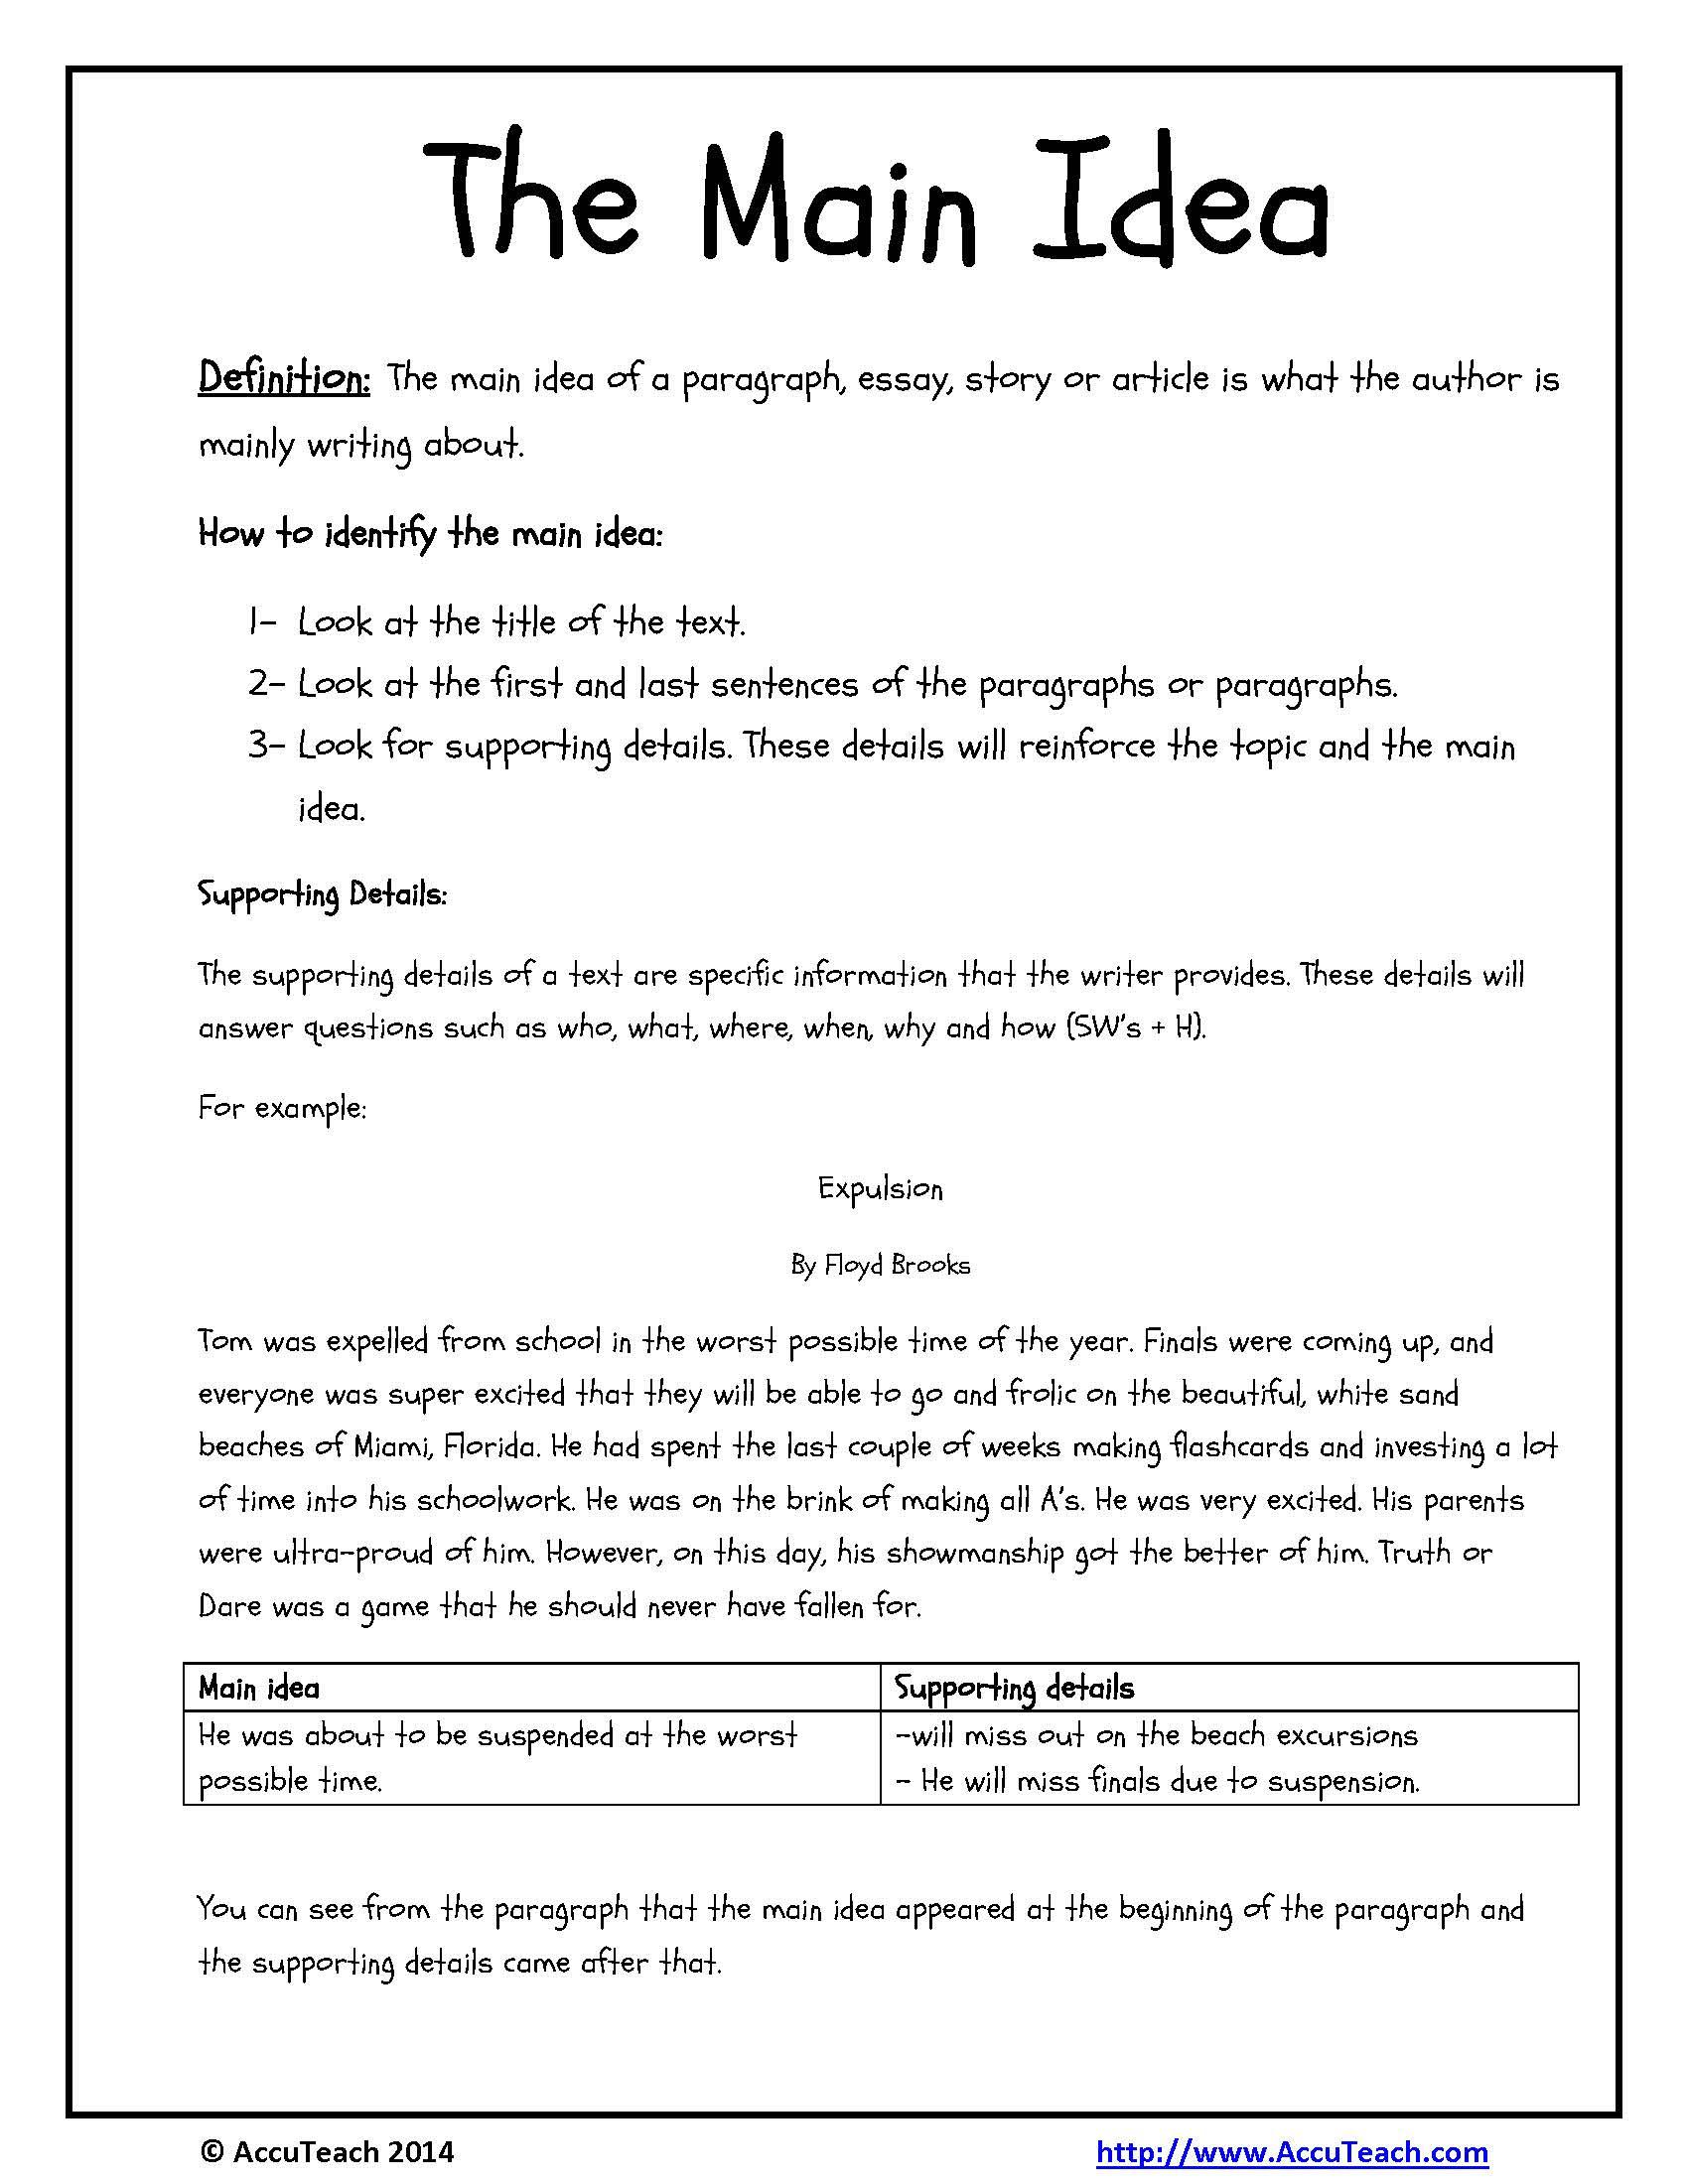 Reading Comprehension Strategy Main Idea